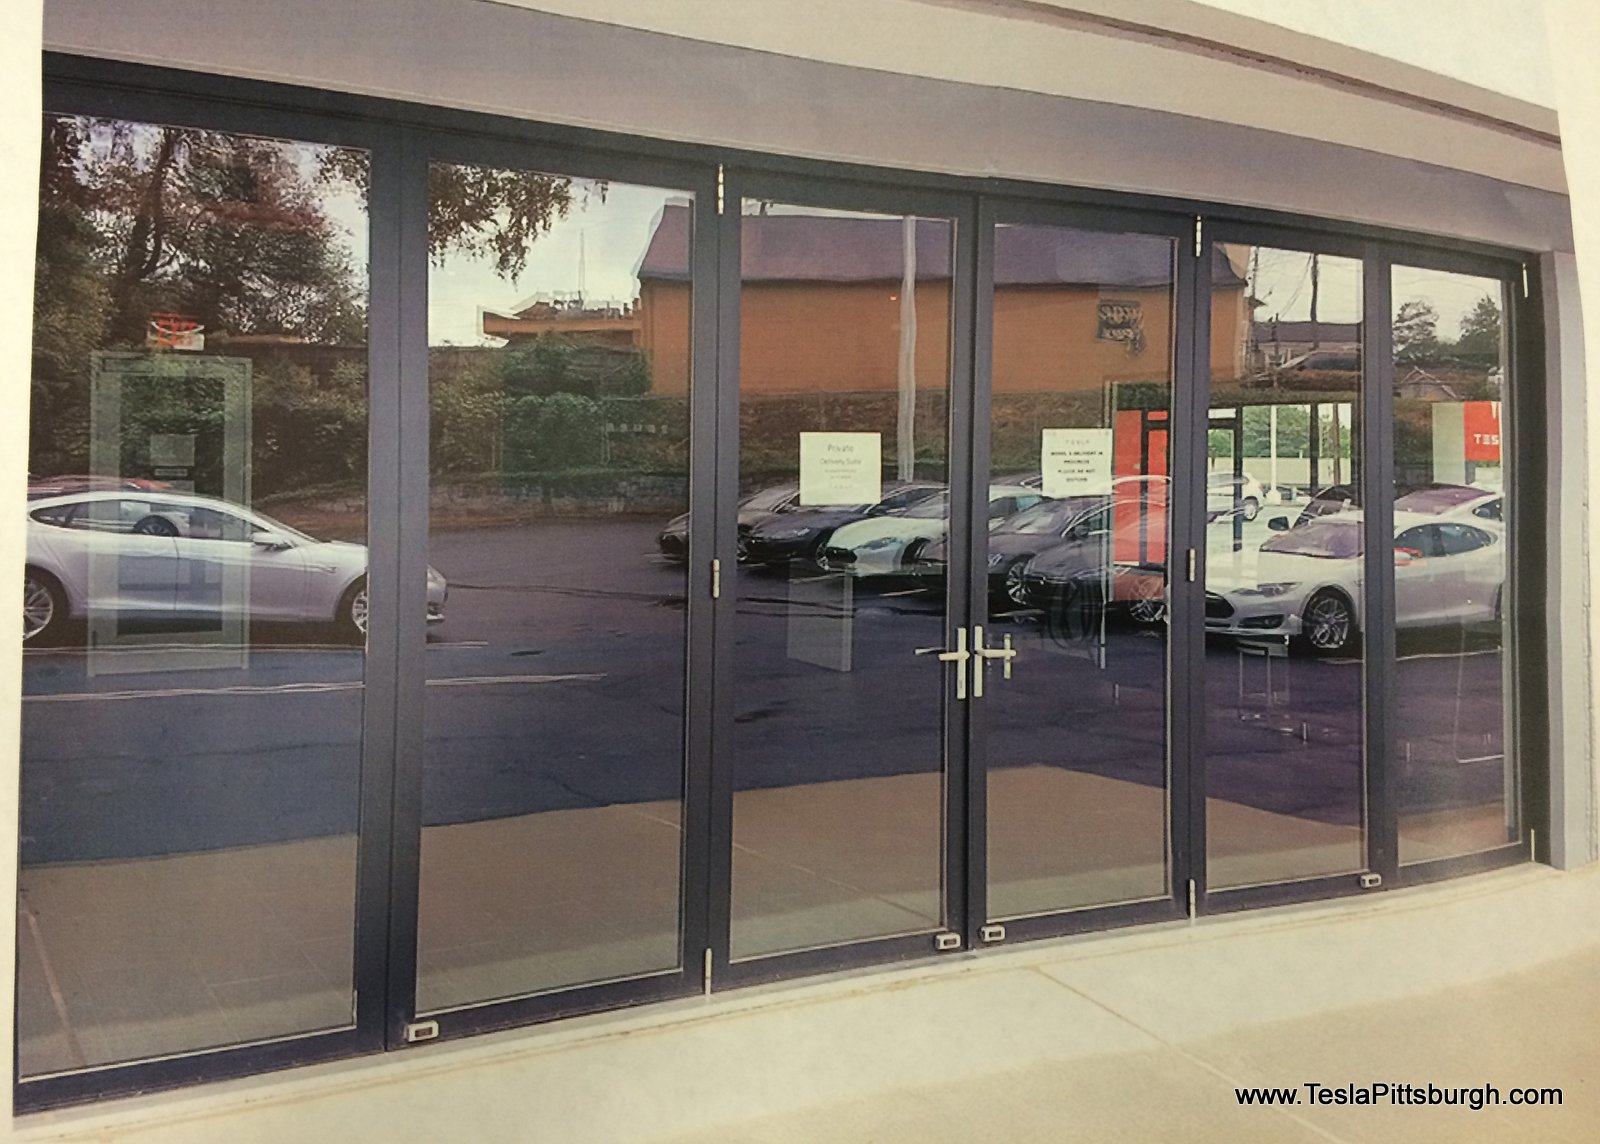 pittsburgh tesla service center door proposal exterior